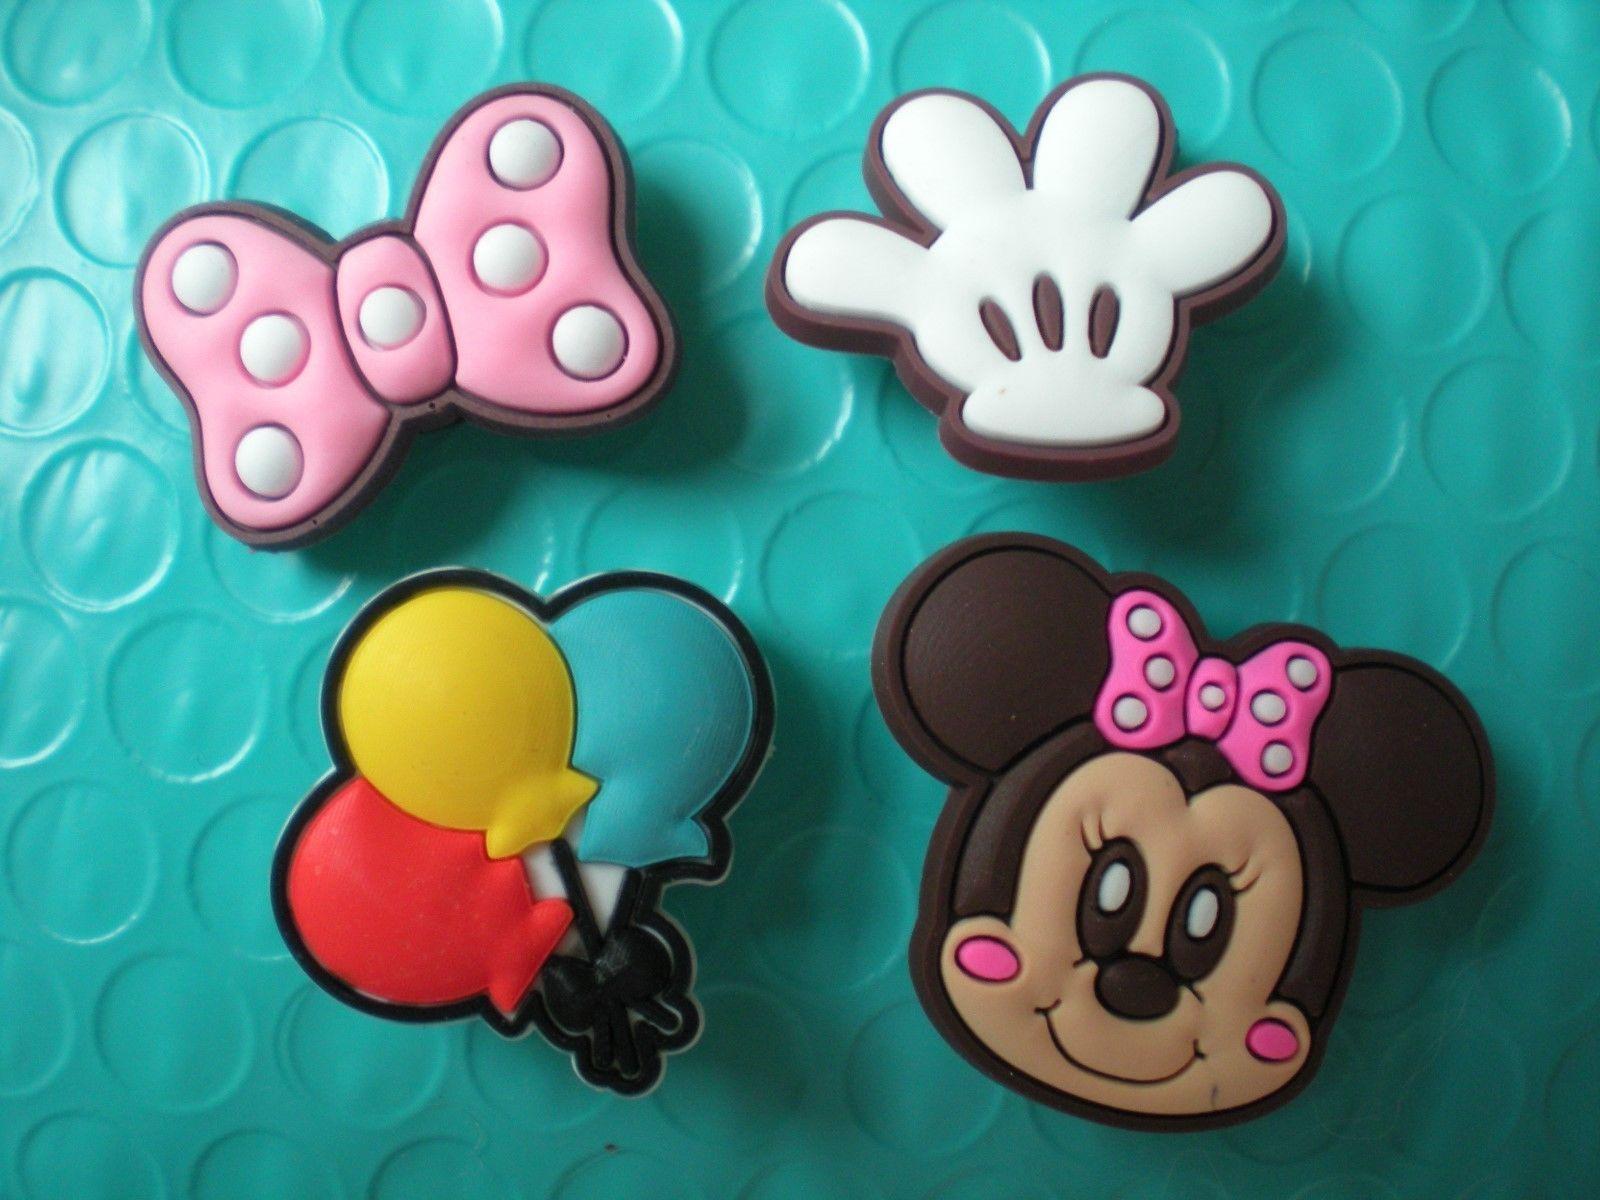 Jewelry & Watches Clog Jibbitz Charm Plug Shoe Accessories Fit Wristband Mickey Minnie Mouse